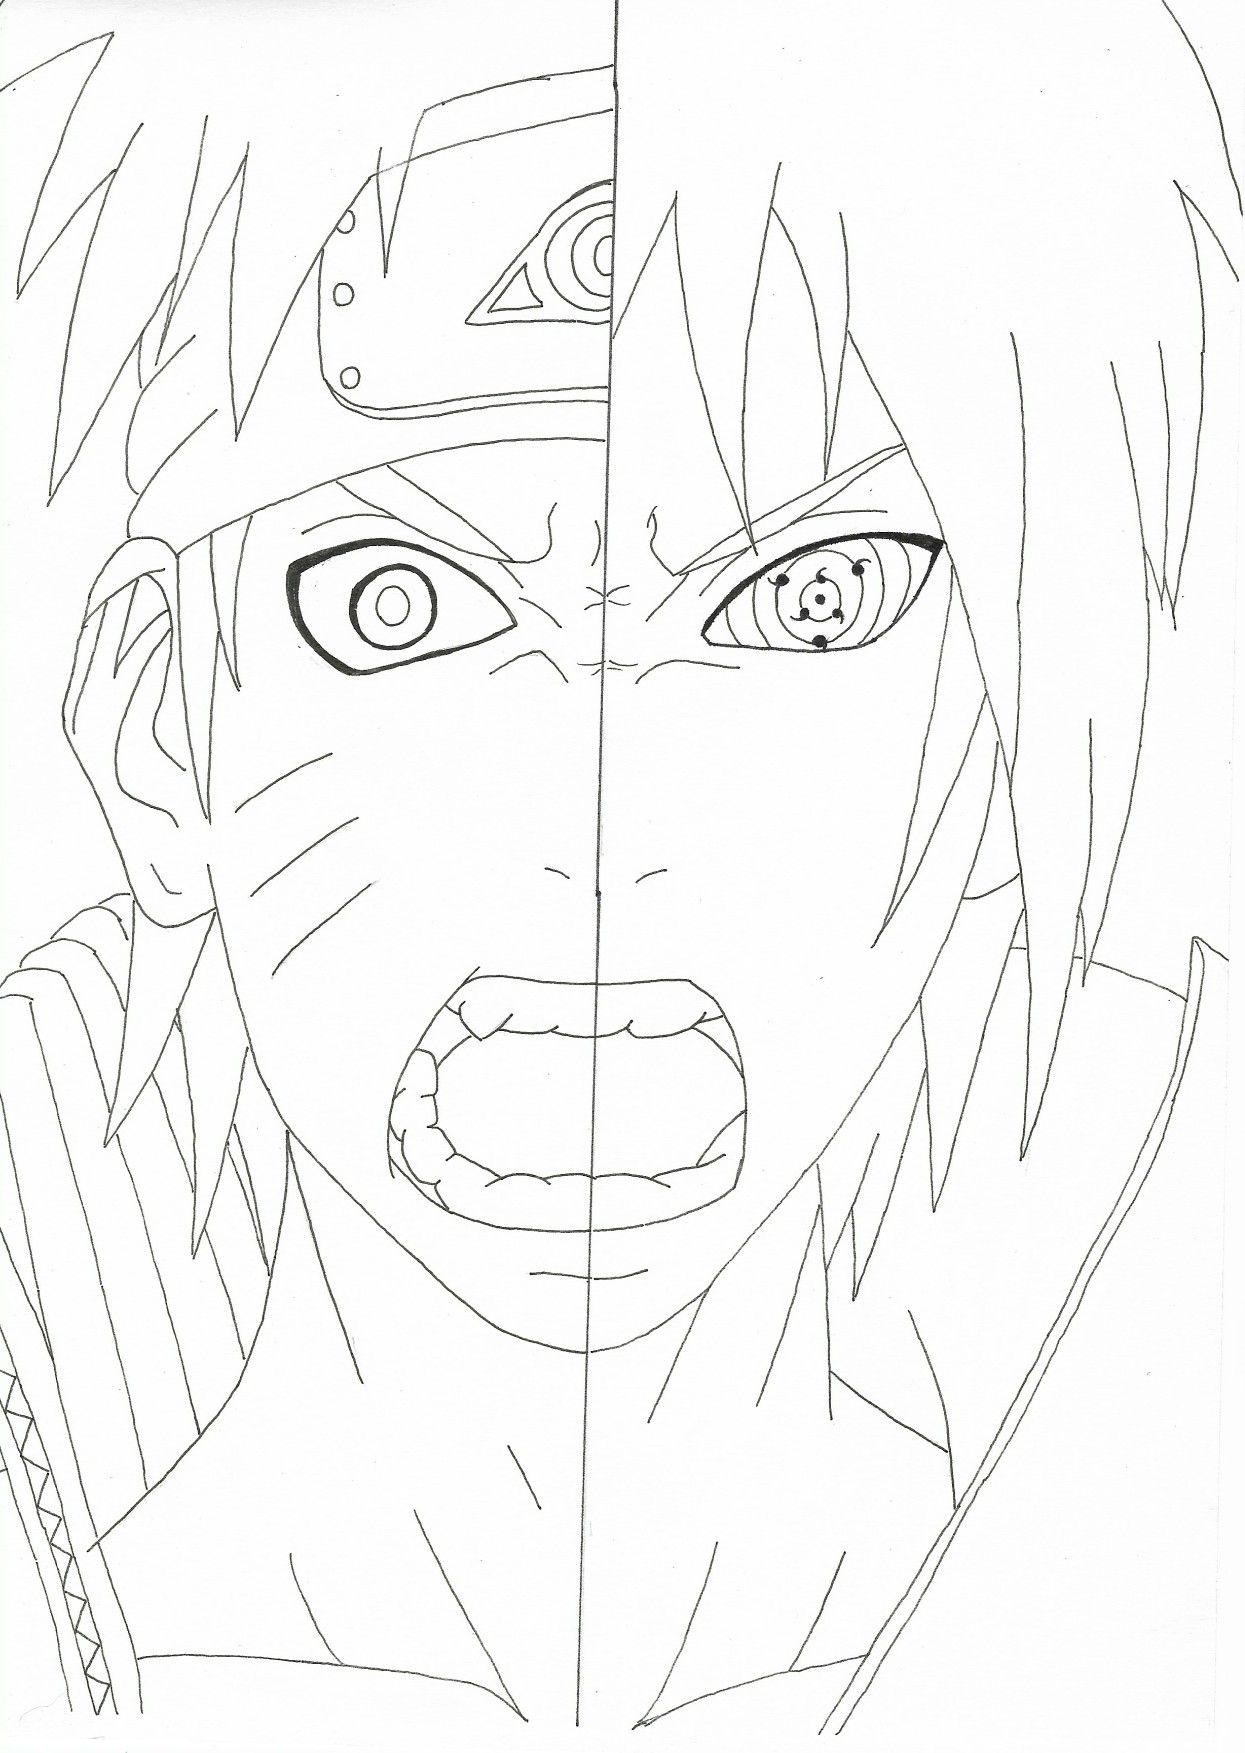 Sasuke vs Naruto imagens) Desenhos para colorir